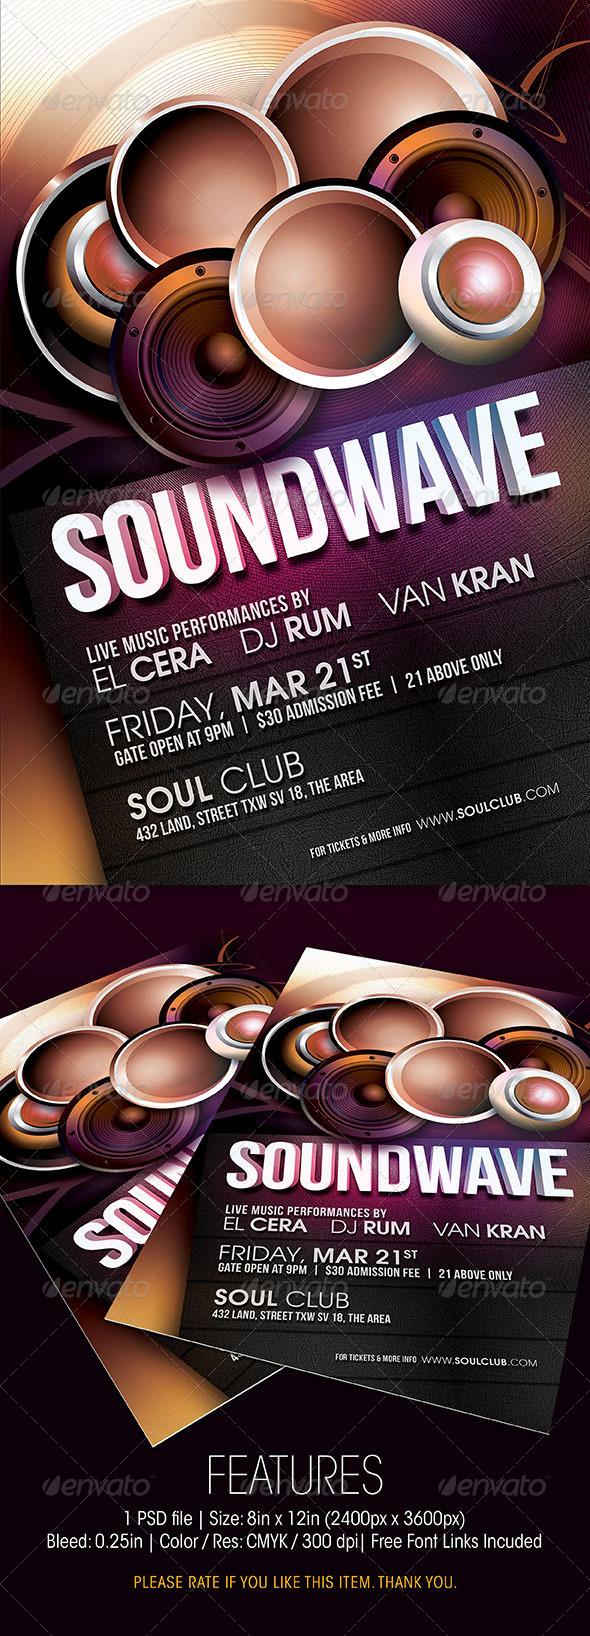 GraphicRiver Soundwave Party Flyer 6464935